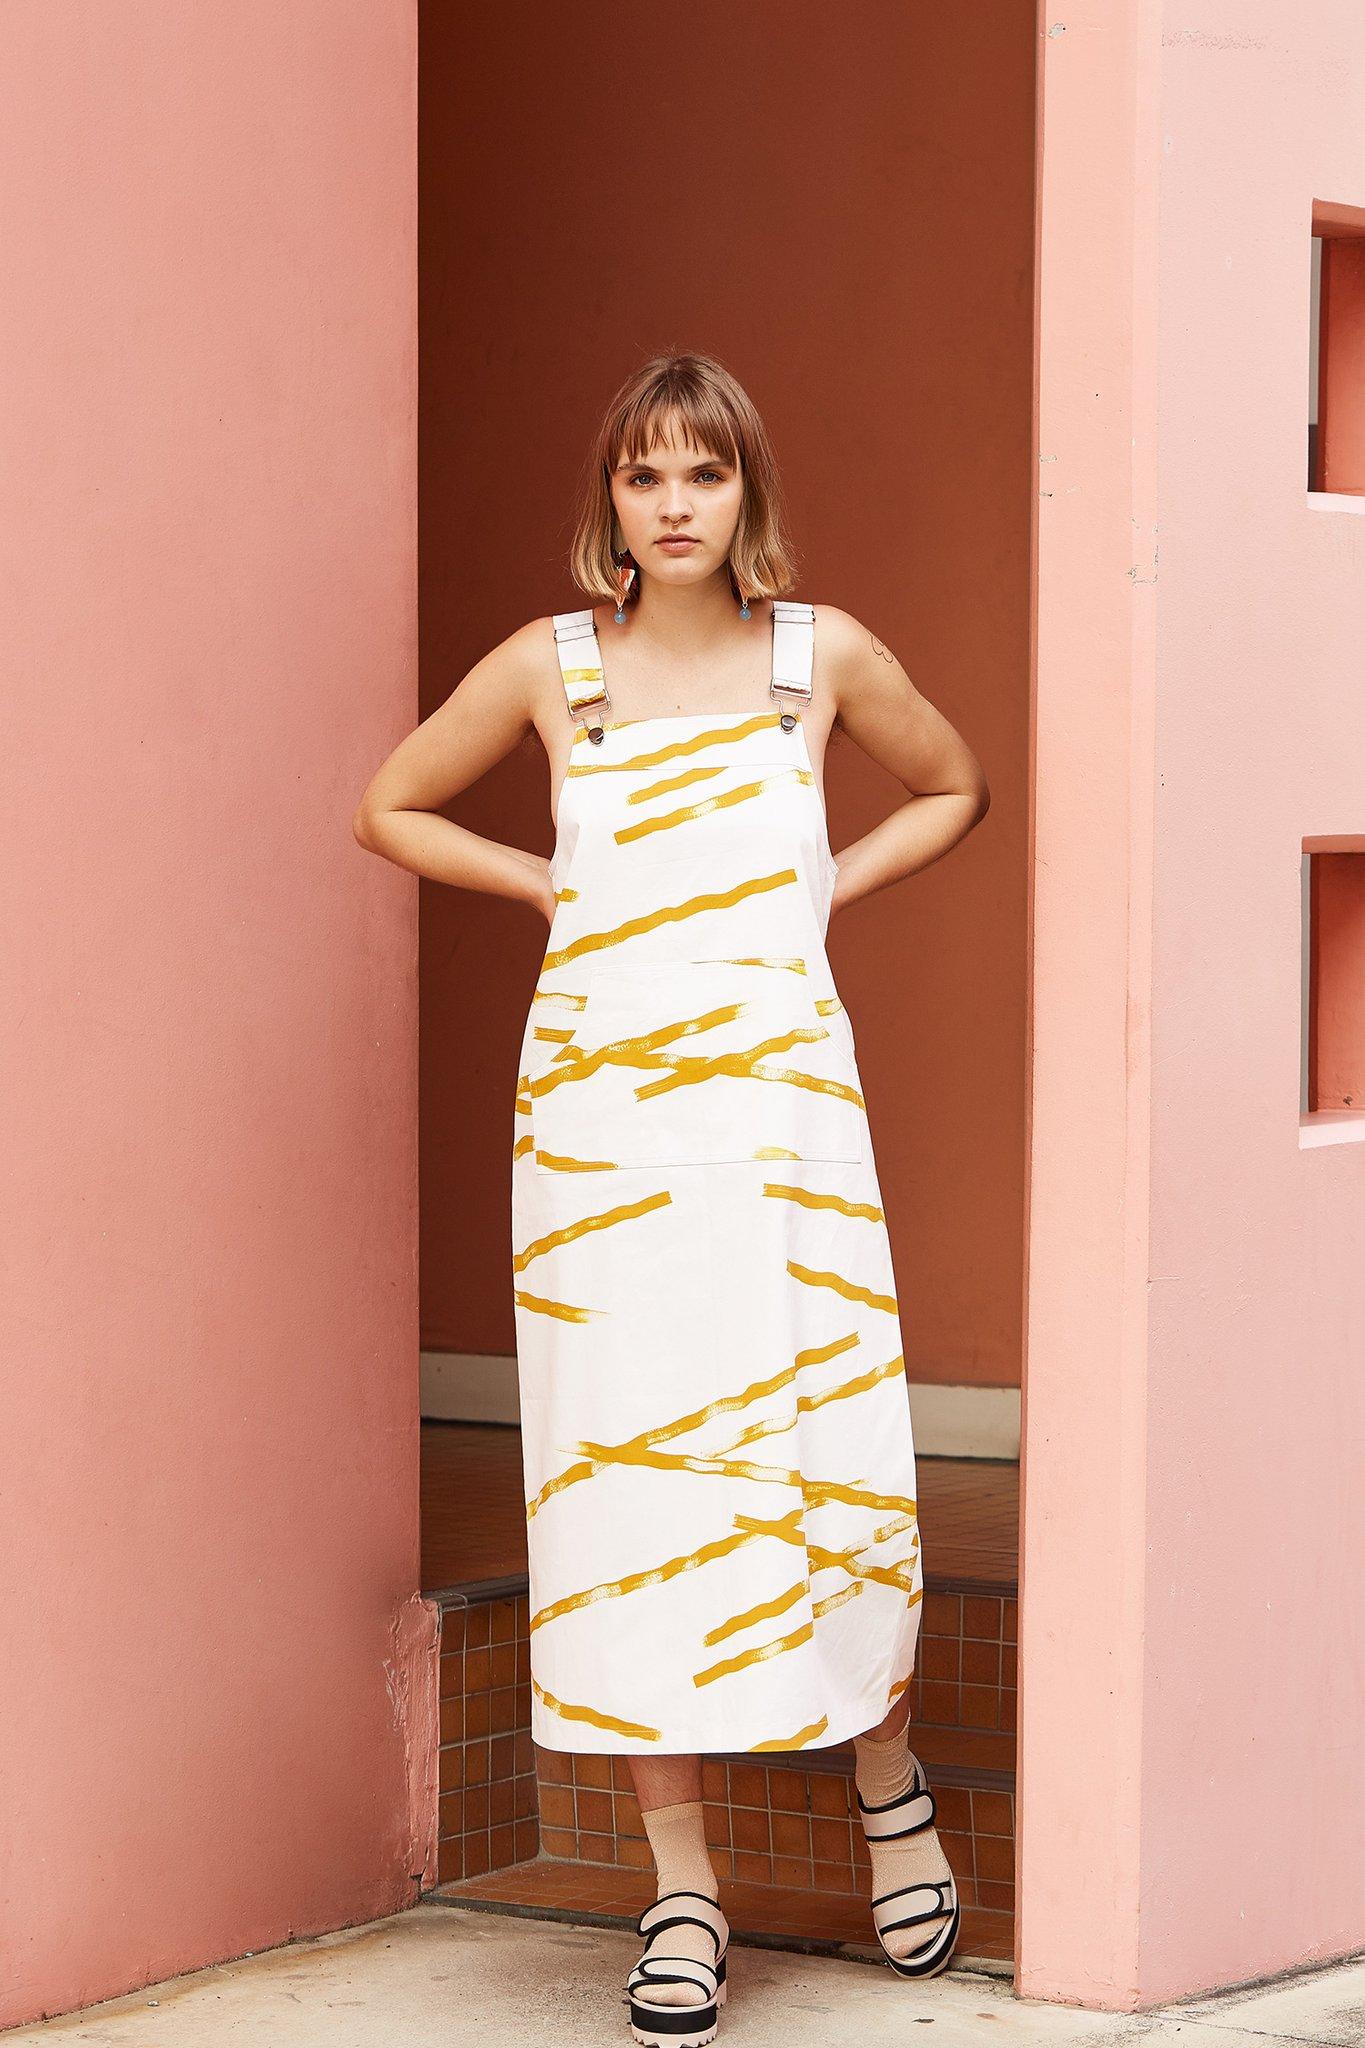 IVY-NIU-Overall-Dress-Yellow-Weave-2_2048x2048.jpg